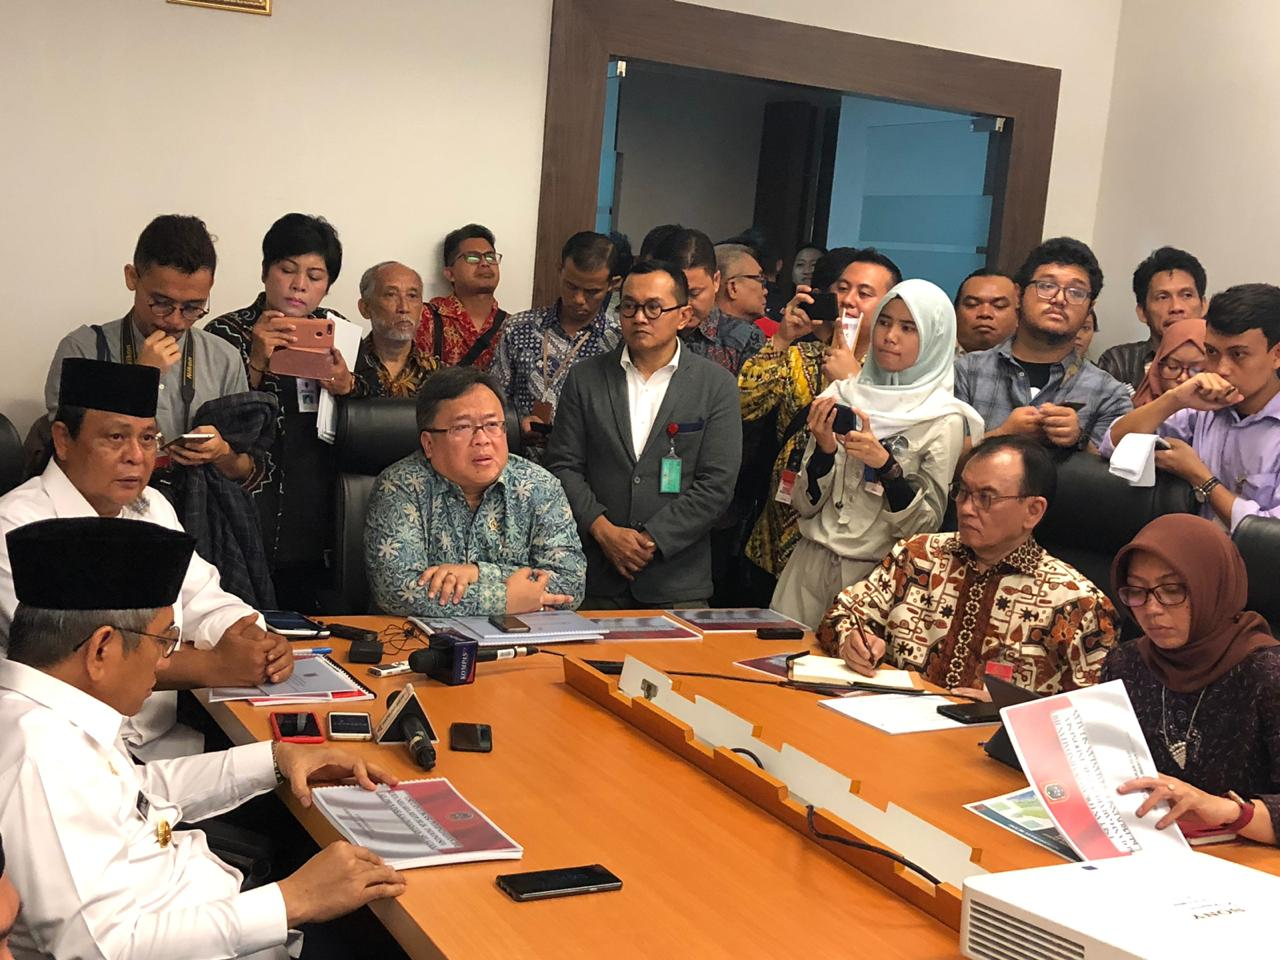 KSP Gelar Diskusi bersama 4 Kepala Daerah yang Berpotensi Jadi Calon Ibukota